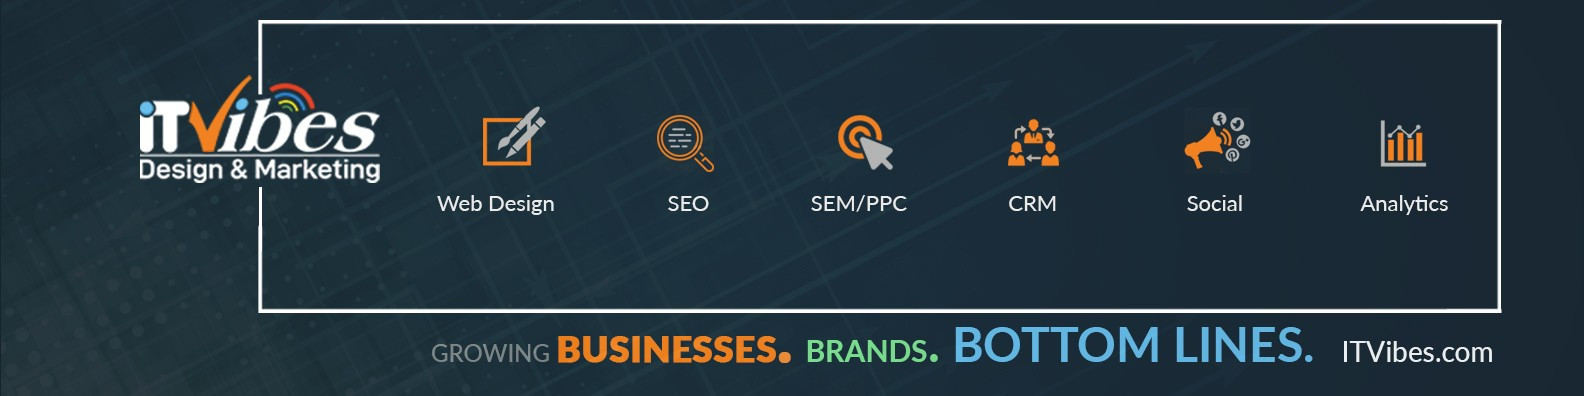 Itvibes Inc Houston Web Design And Digital Marketing Agency Linkedin